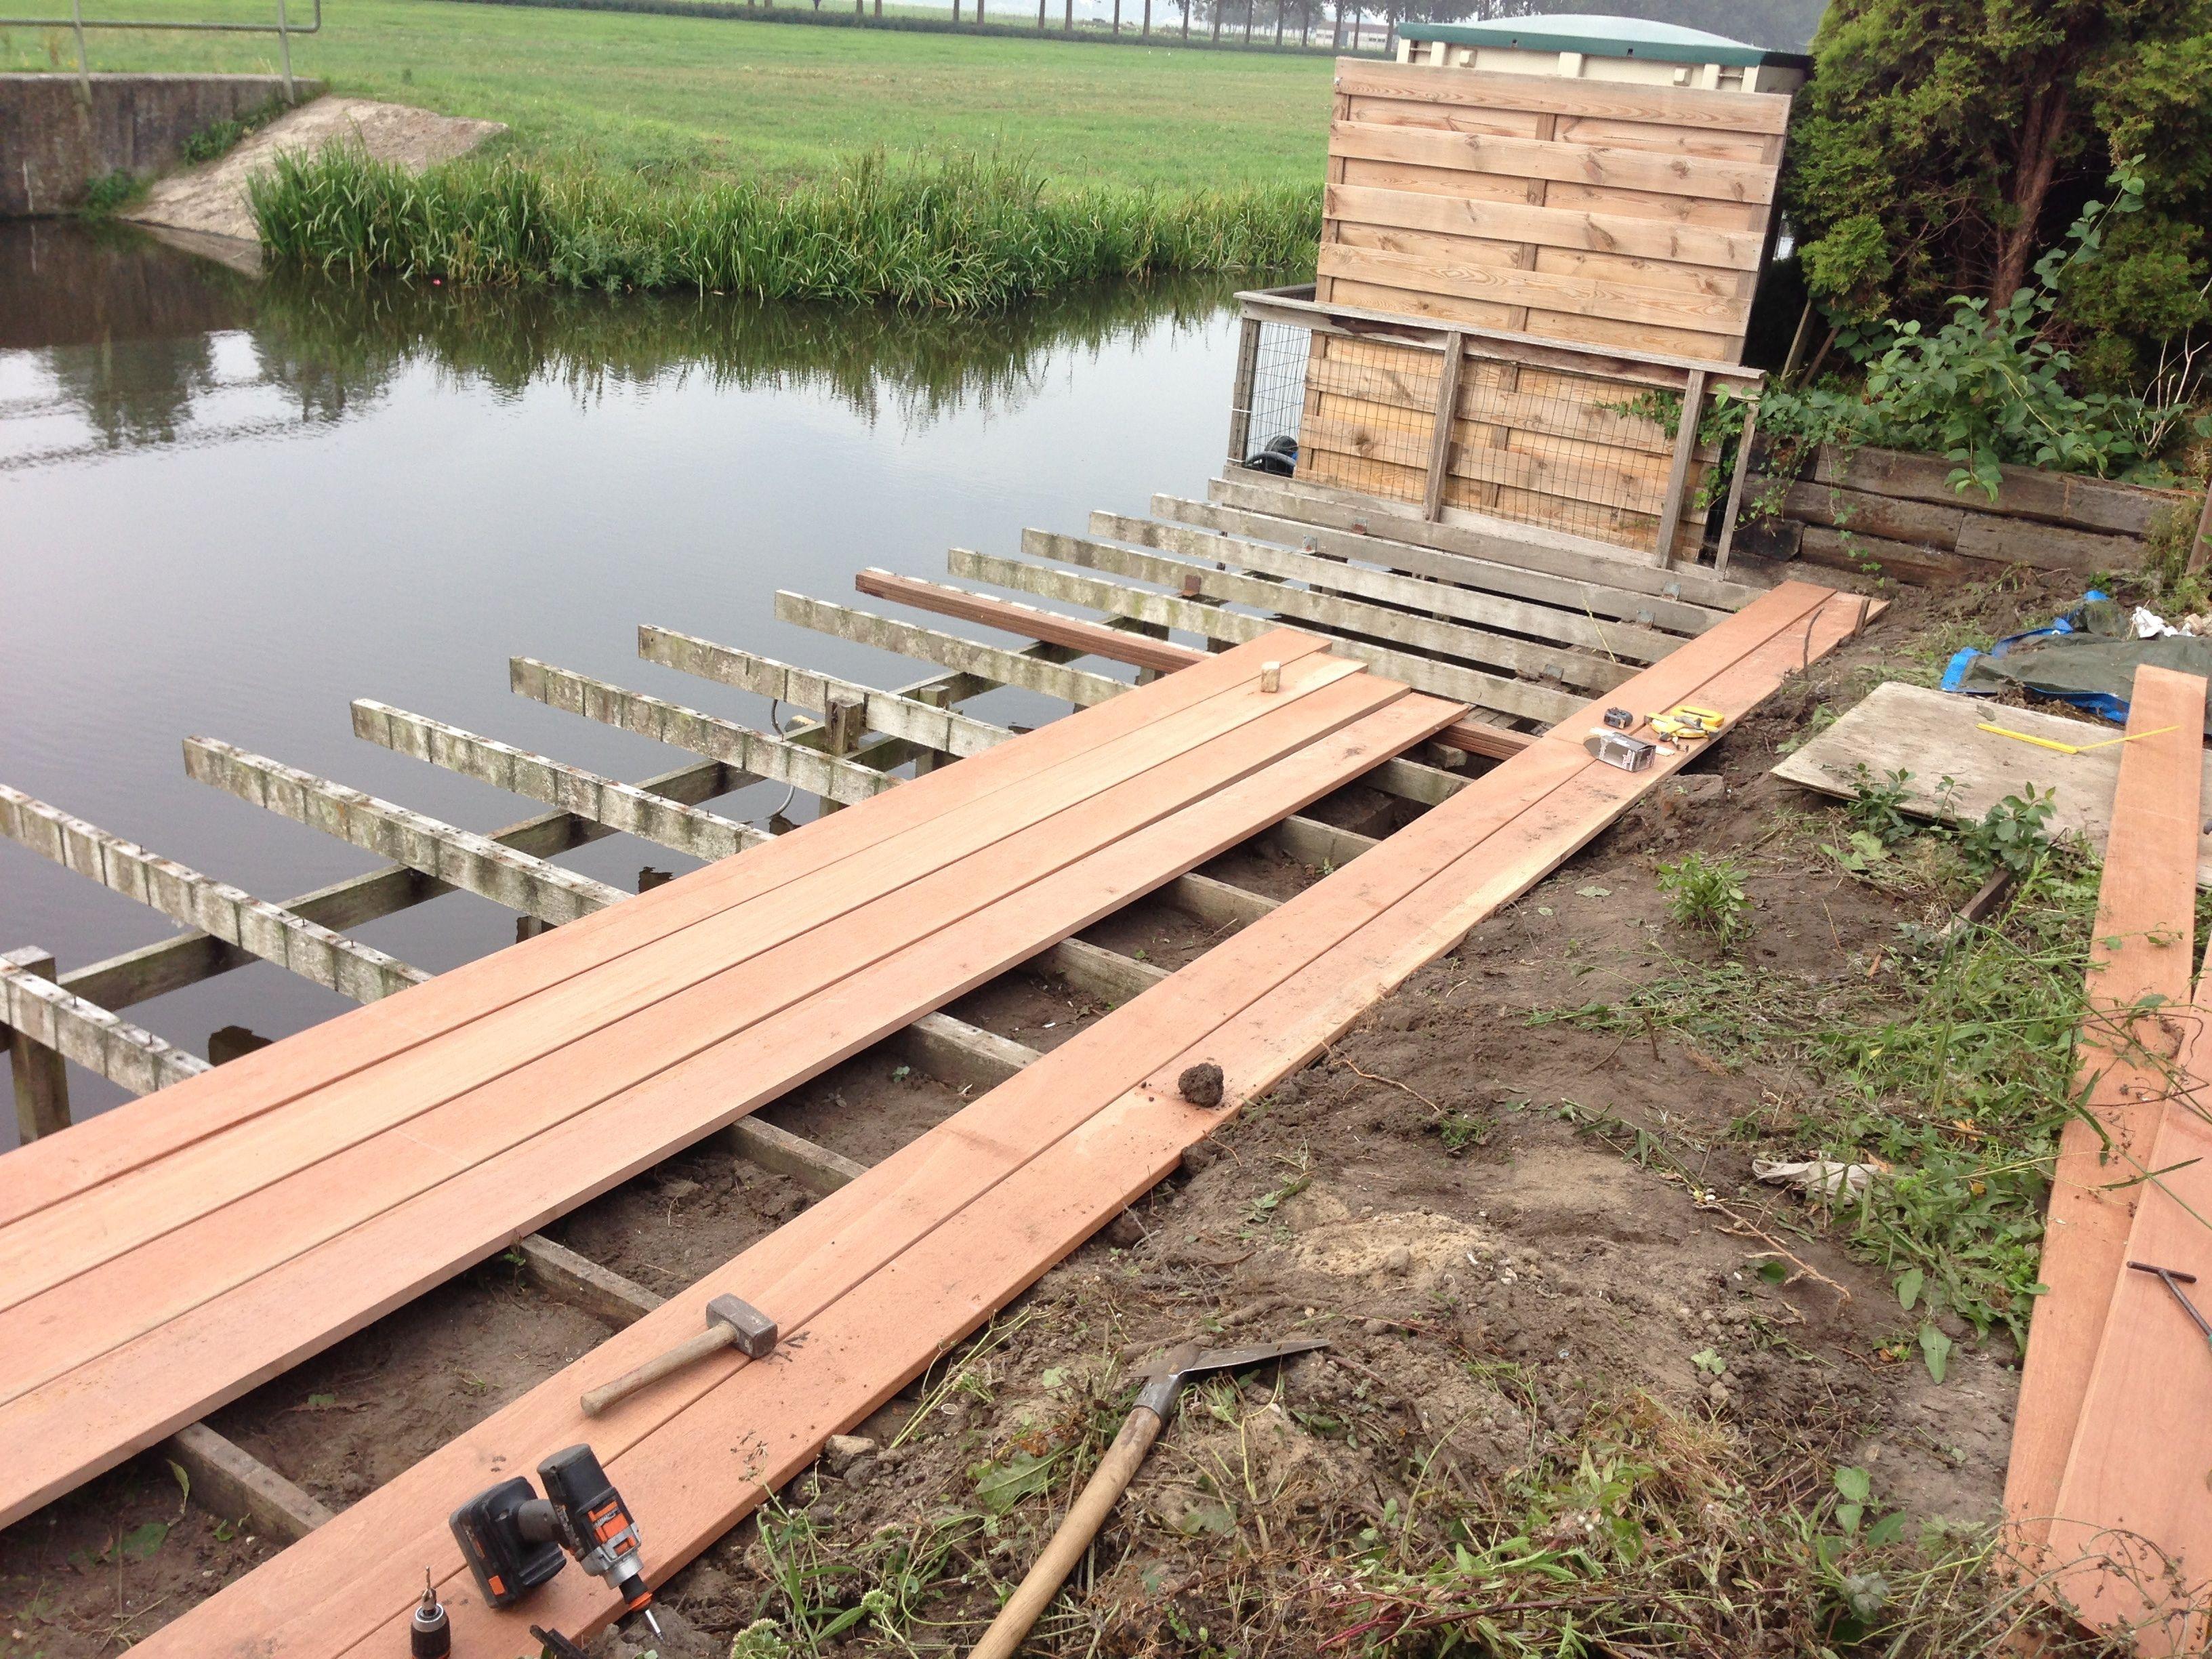 Vlonder hout en tegels google zoeken tuin pinterest searching - Houten terras en tegels ...